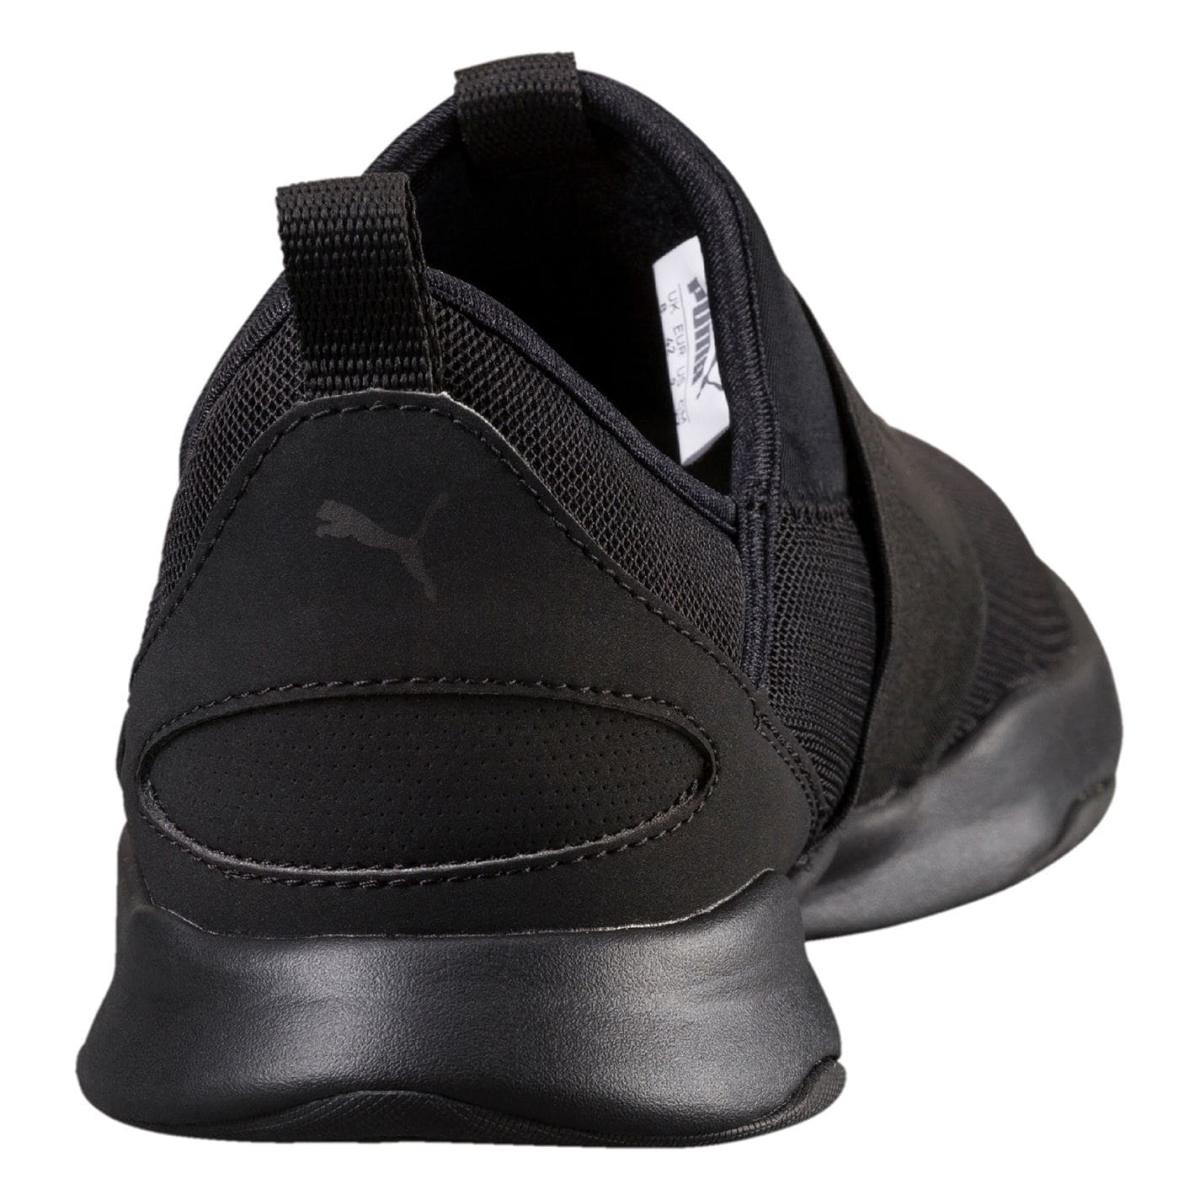 Puma-Dare-Turnschuhe-Laufschuhe-Damen-Sneaker-Trainers-Sportschuhe-5890 Indexbild 6